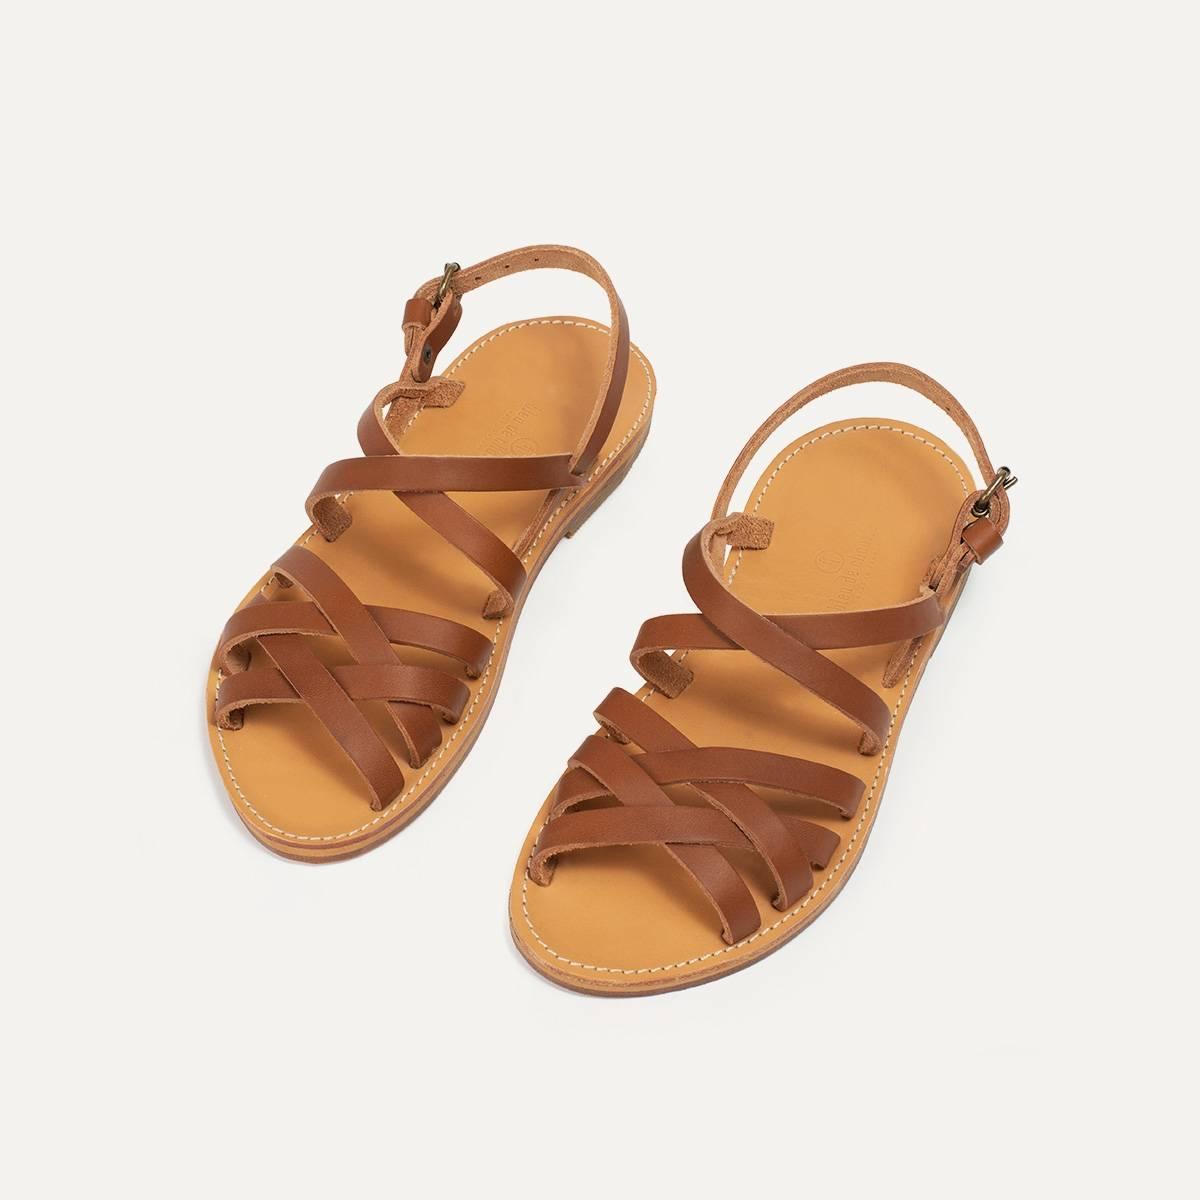 Sandales cuir Majour - Pain Brûlé (image n°4)